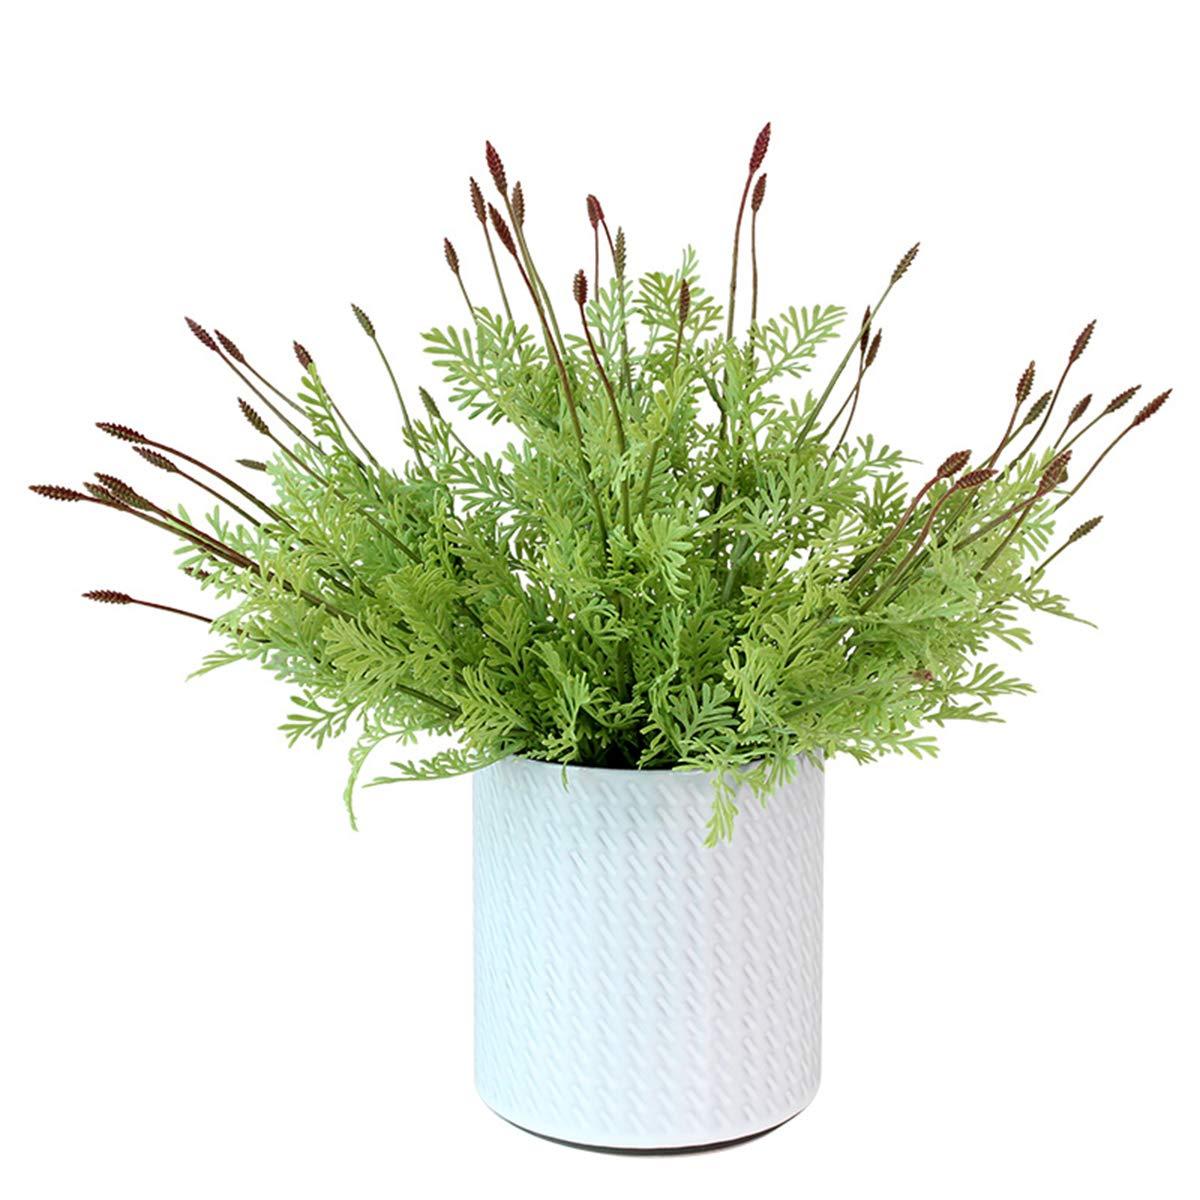 marlles人工フェイクプラスチック低木Greenery植物Cedar Bushes花フィラーインドア外側ホームガーデンOfficeベランダ飾り 2 Pcs グリーン MLLS-TLO-OGR B07D4MQ3HT  2 Pcs